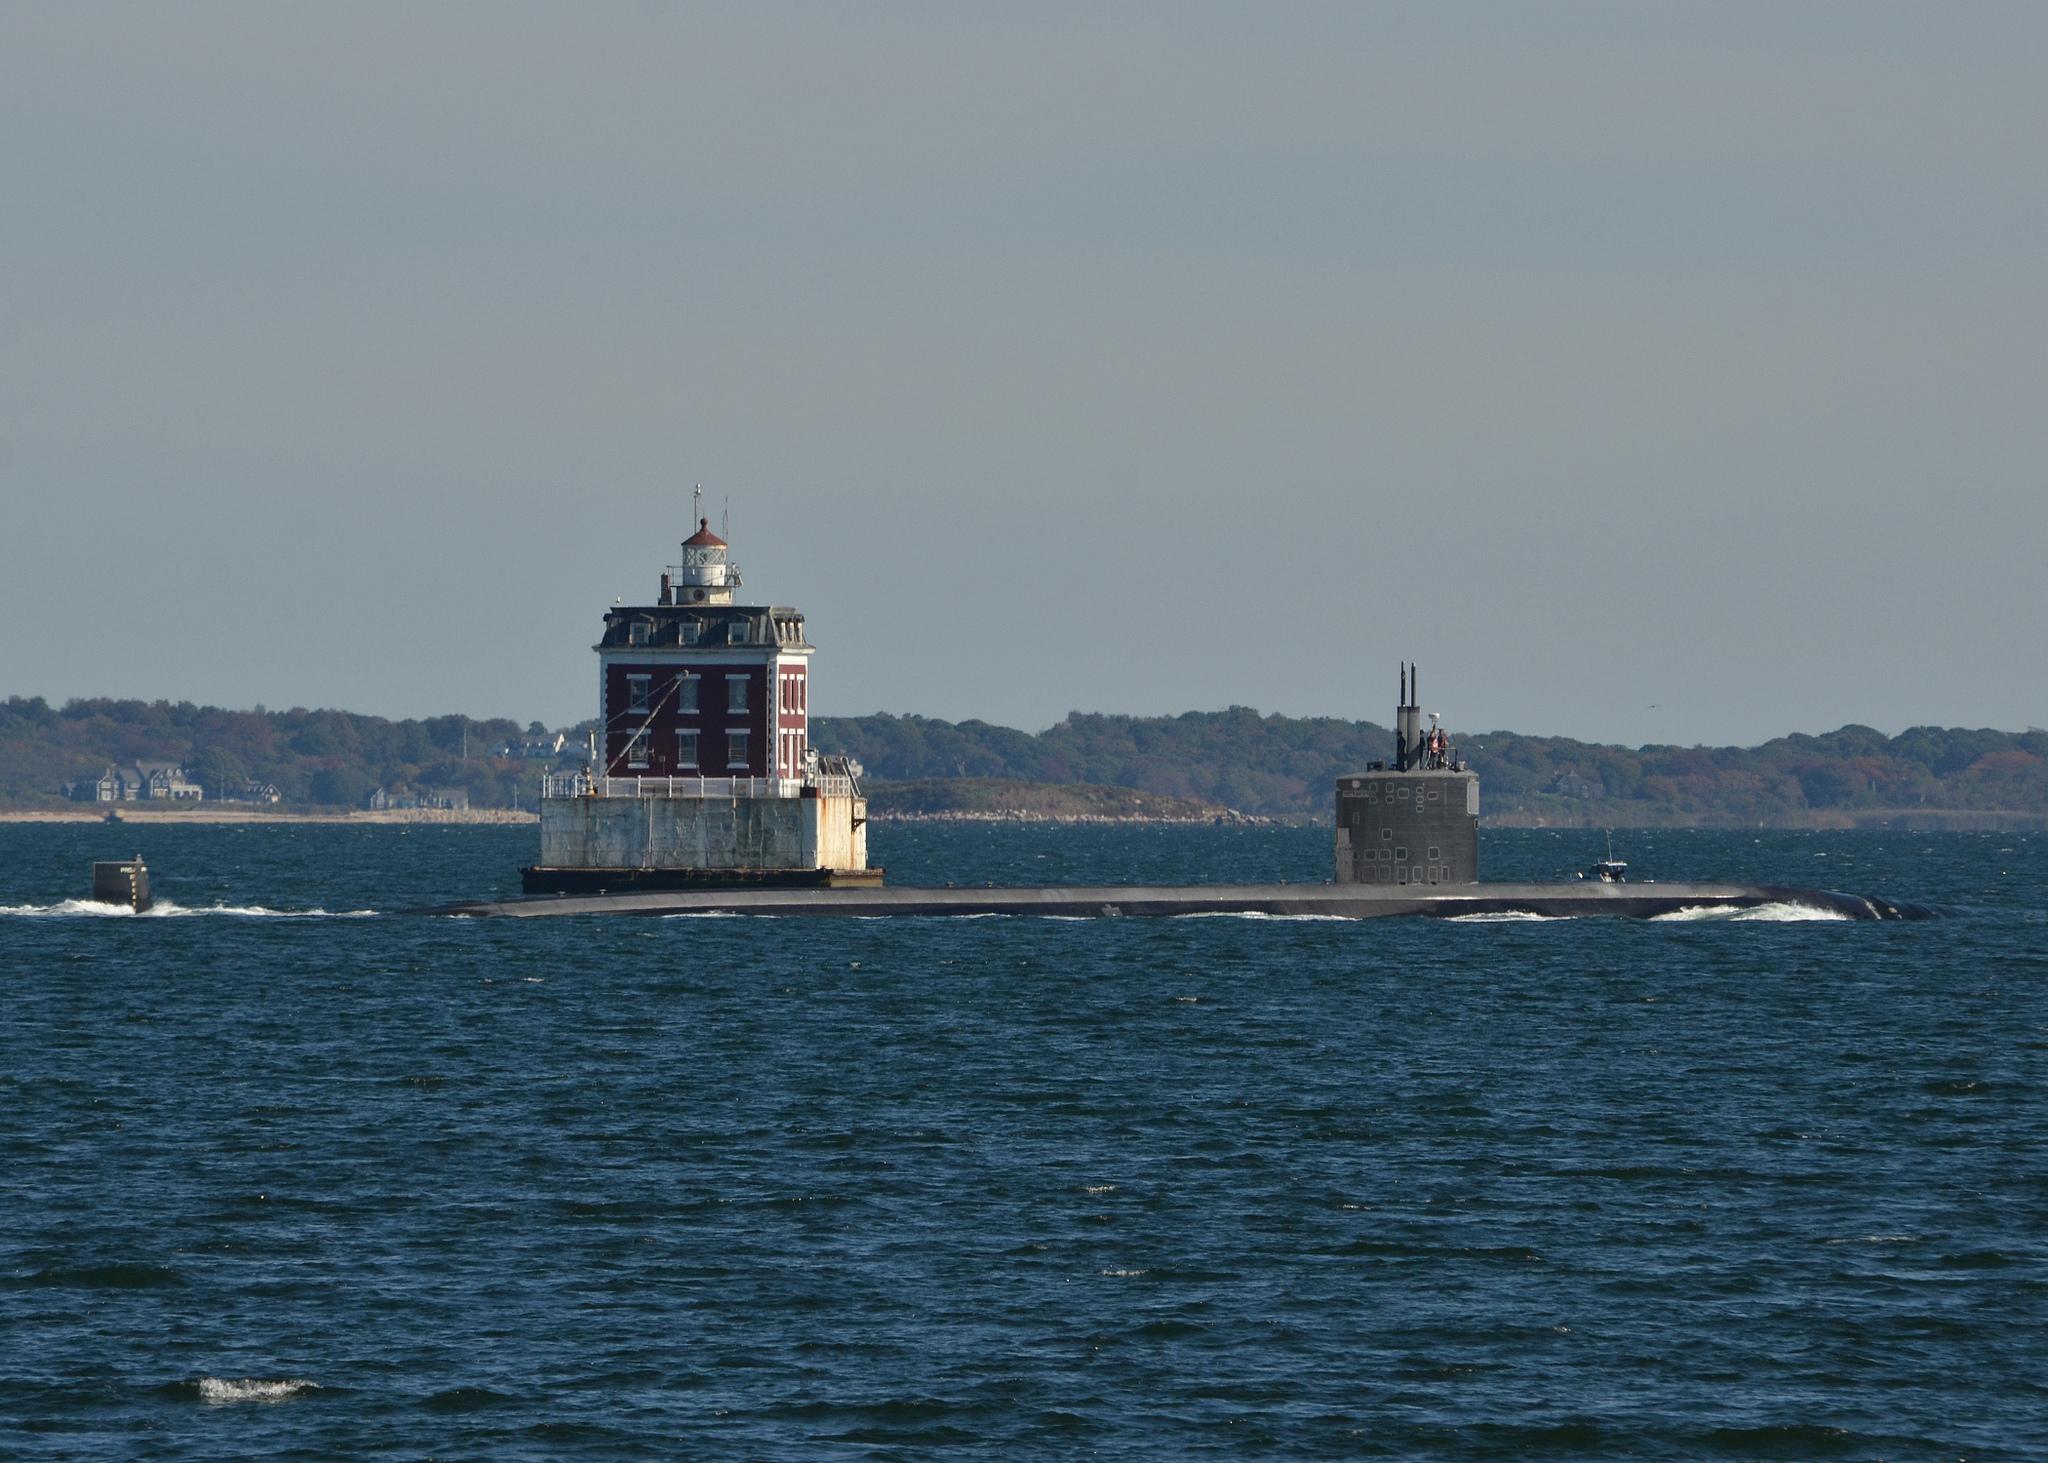 USS SAN JUAN SSN-751 Auslaufen Groton 15.10.2013Bild: U.S. Navy